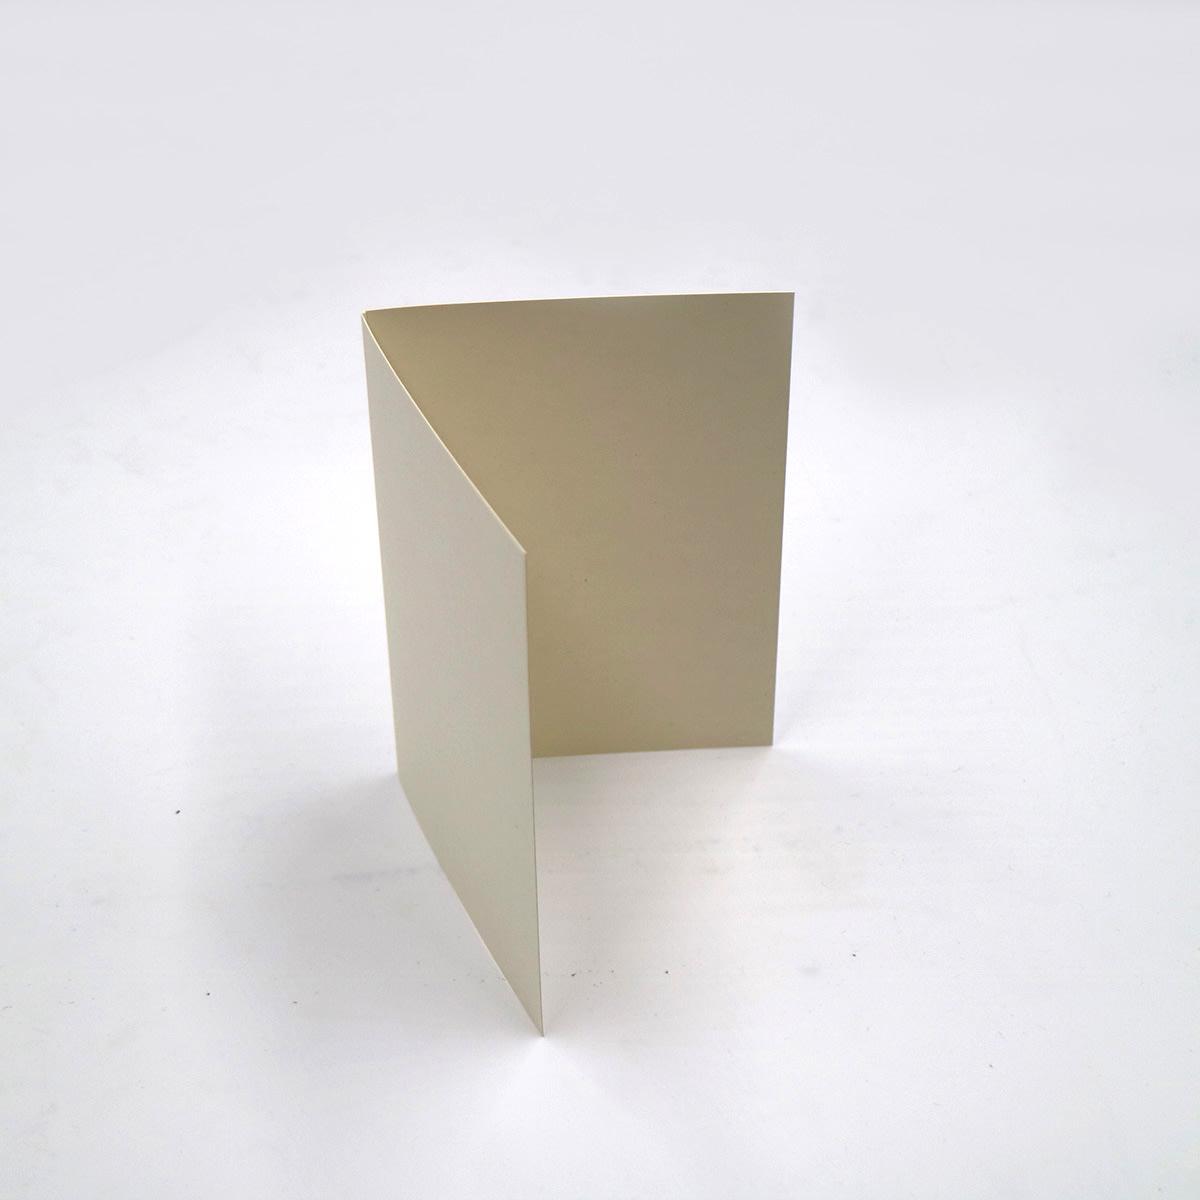 A5 SMOOTH IVORY SINGLE FOLD CARD BLANKS 300GSM